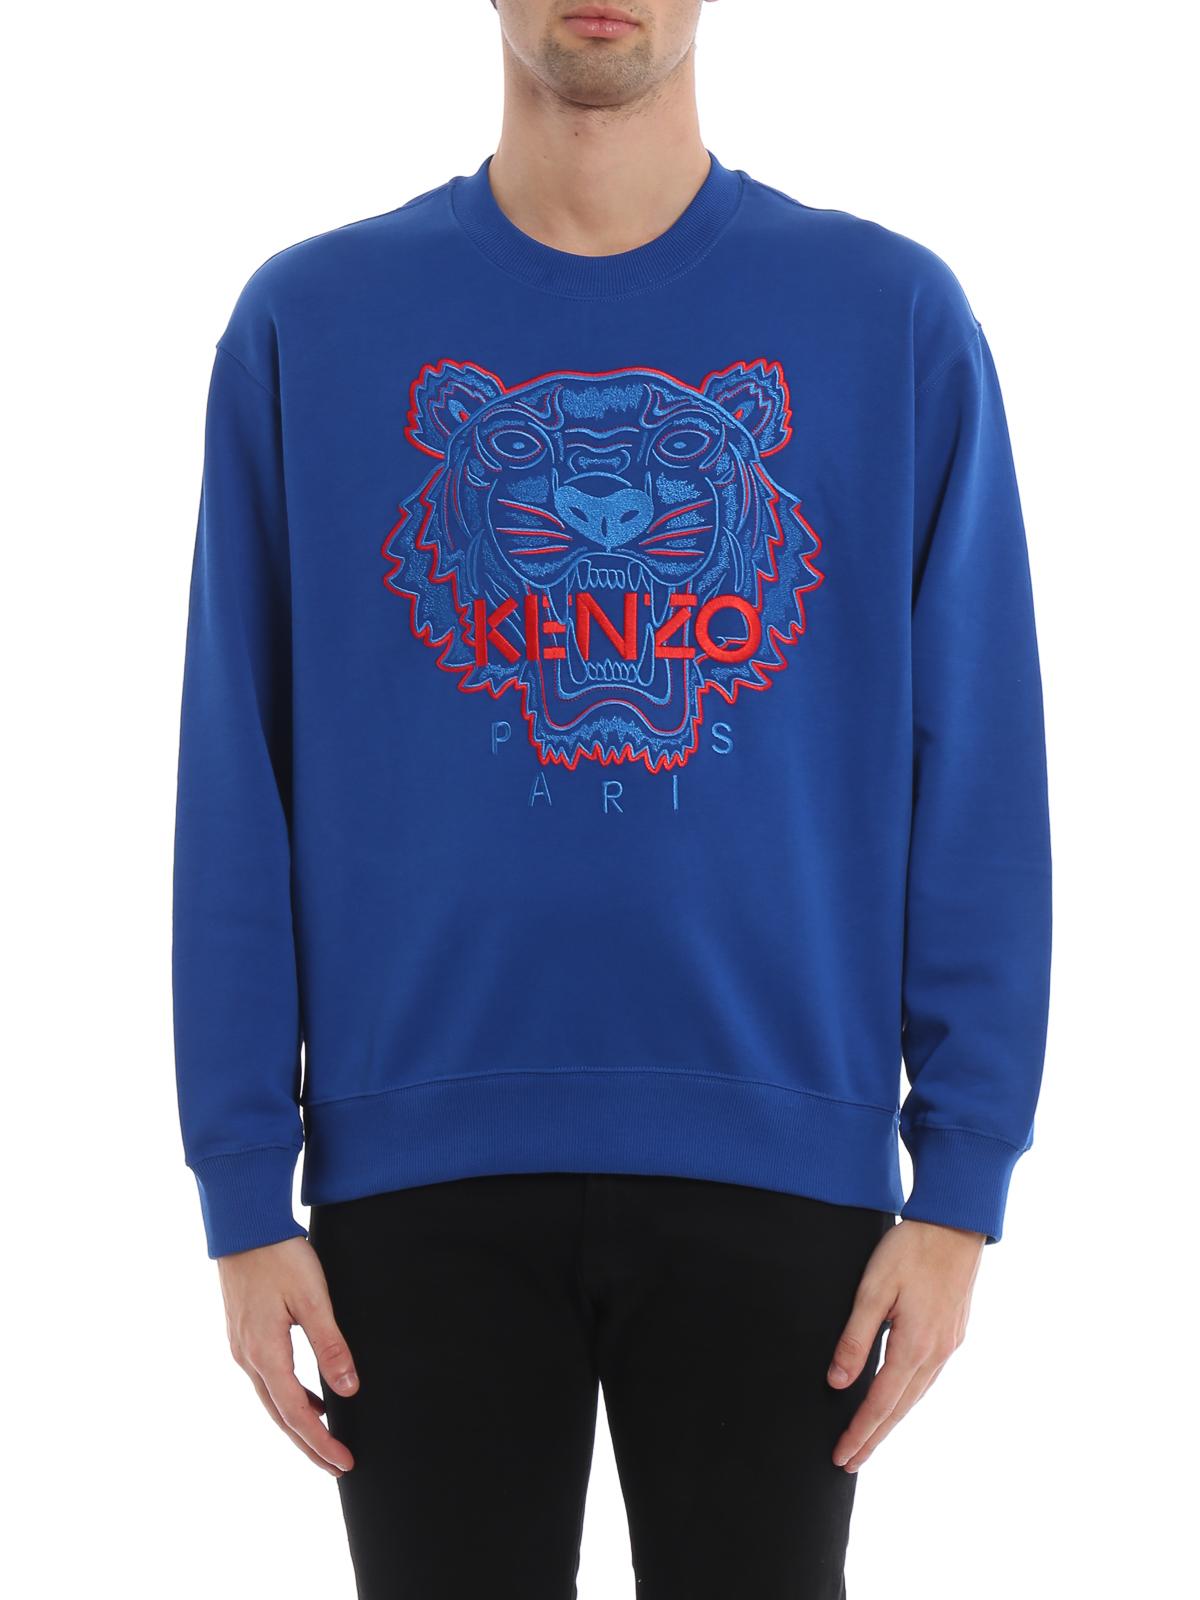 iKRIX KENZO  Sweatshirts   Sweaters - Two-tone cotton Tiger classic  sweatshirt 13d41861d16